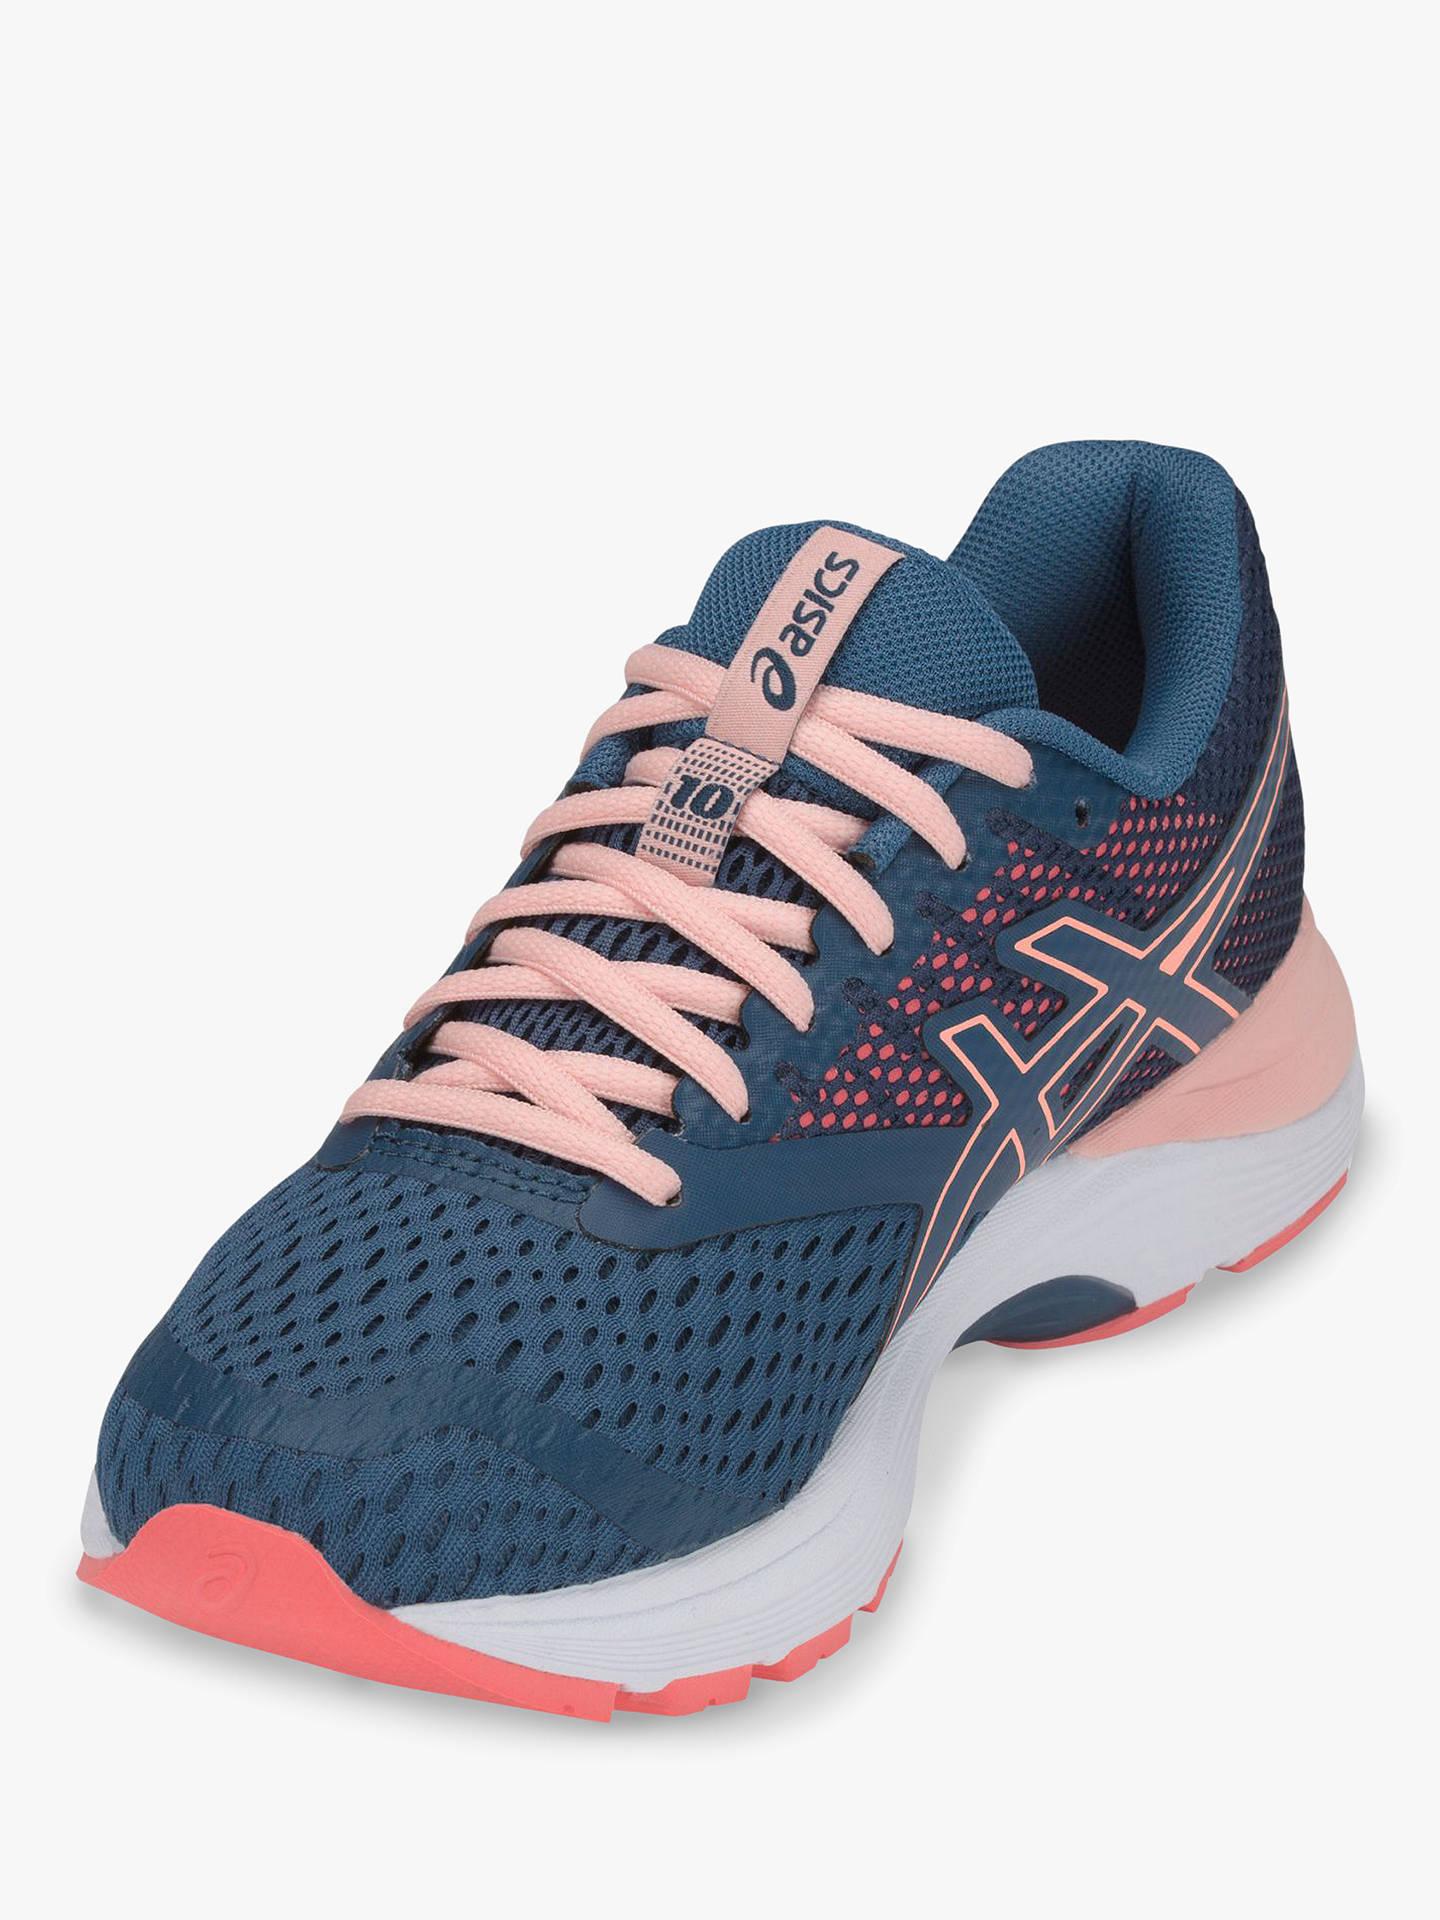 f05acd646b ASICS GEL-PULSE 10 Women's Running Shoes at John Lewis & Partners